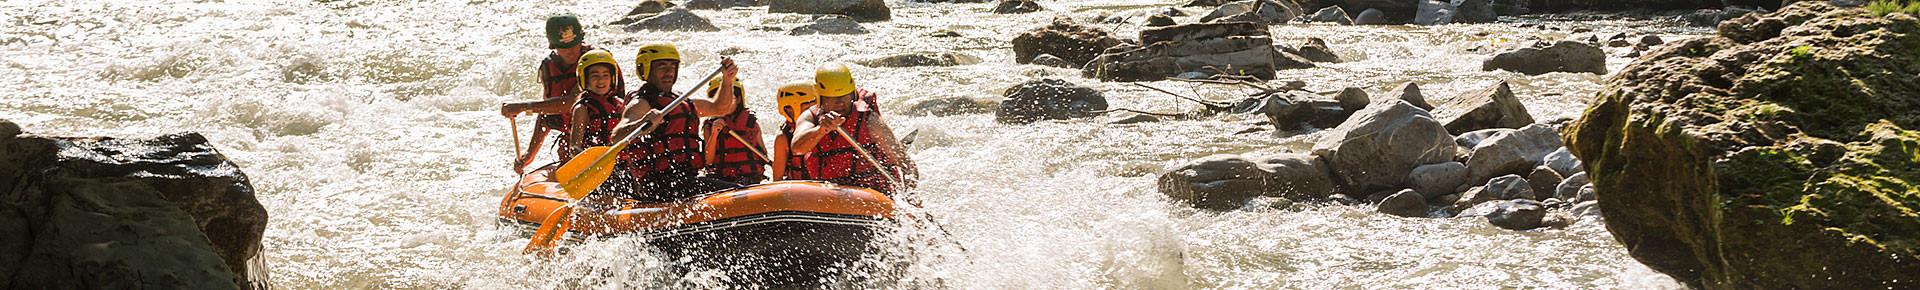 Activités d'été en Vallée d'Aulps